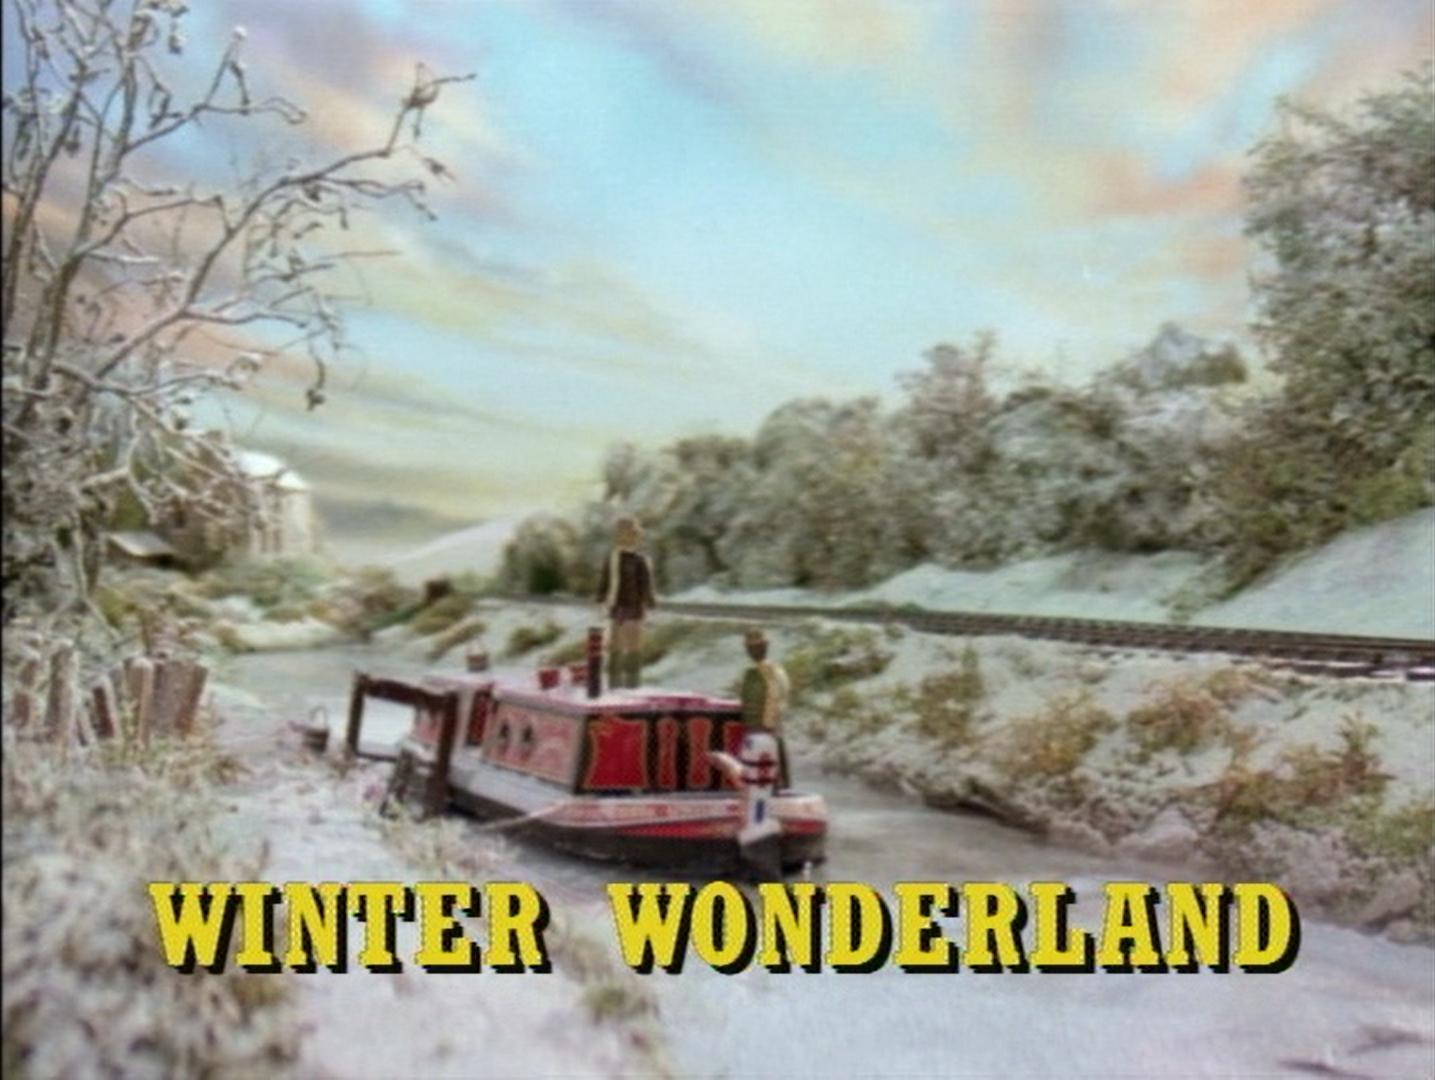 File:WinterWonderlandUStitlecard.png